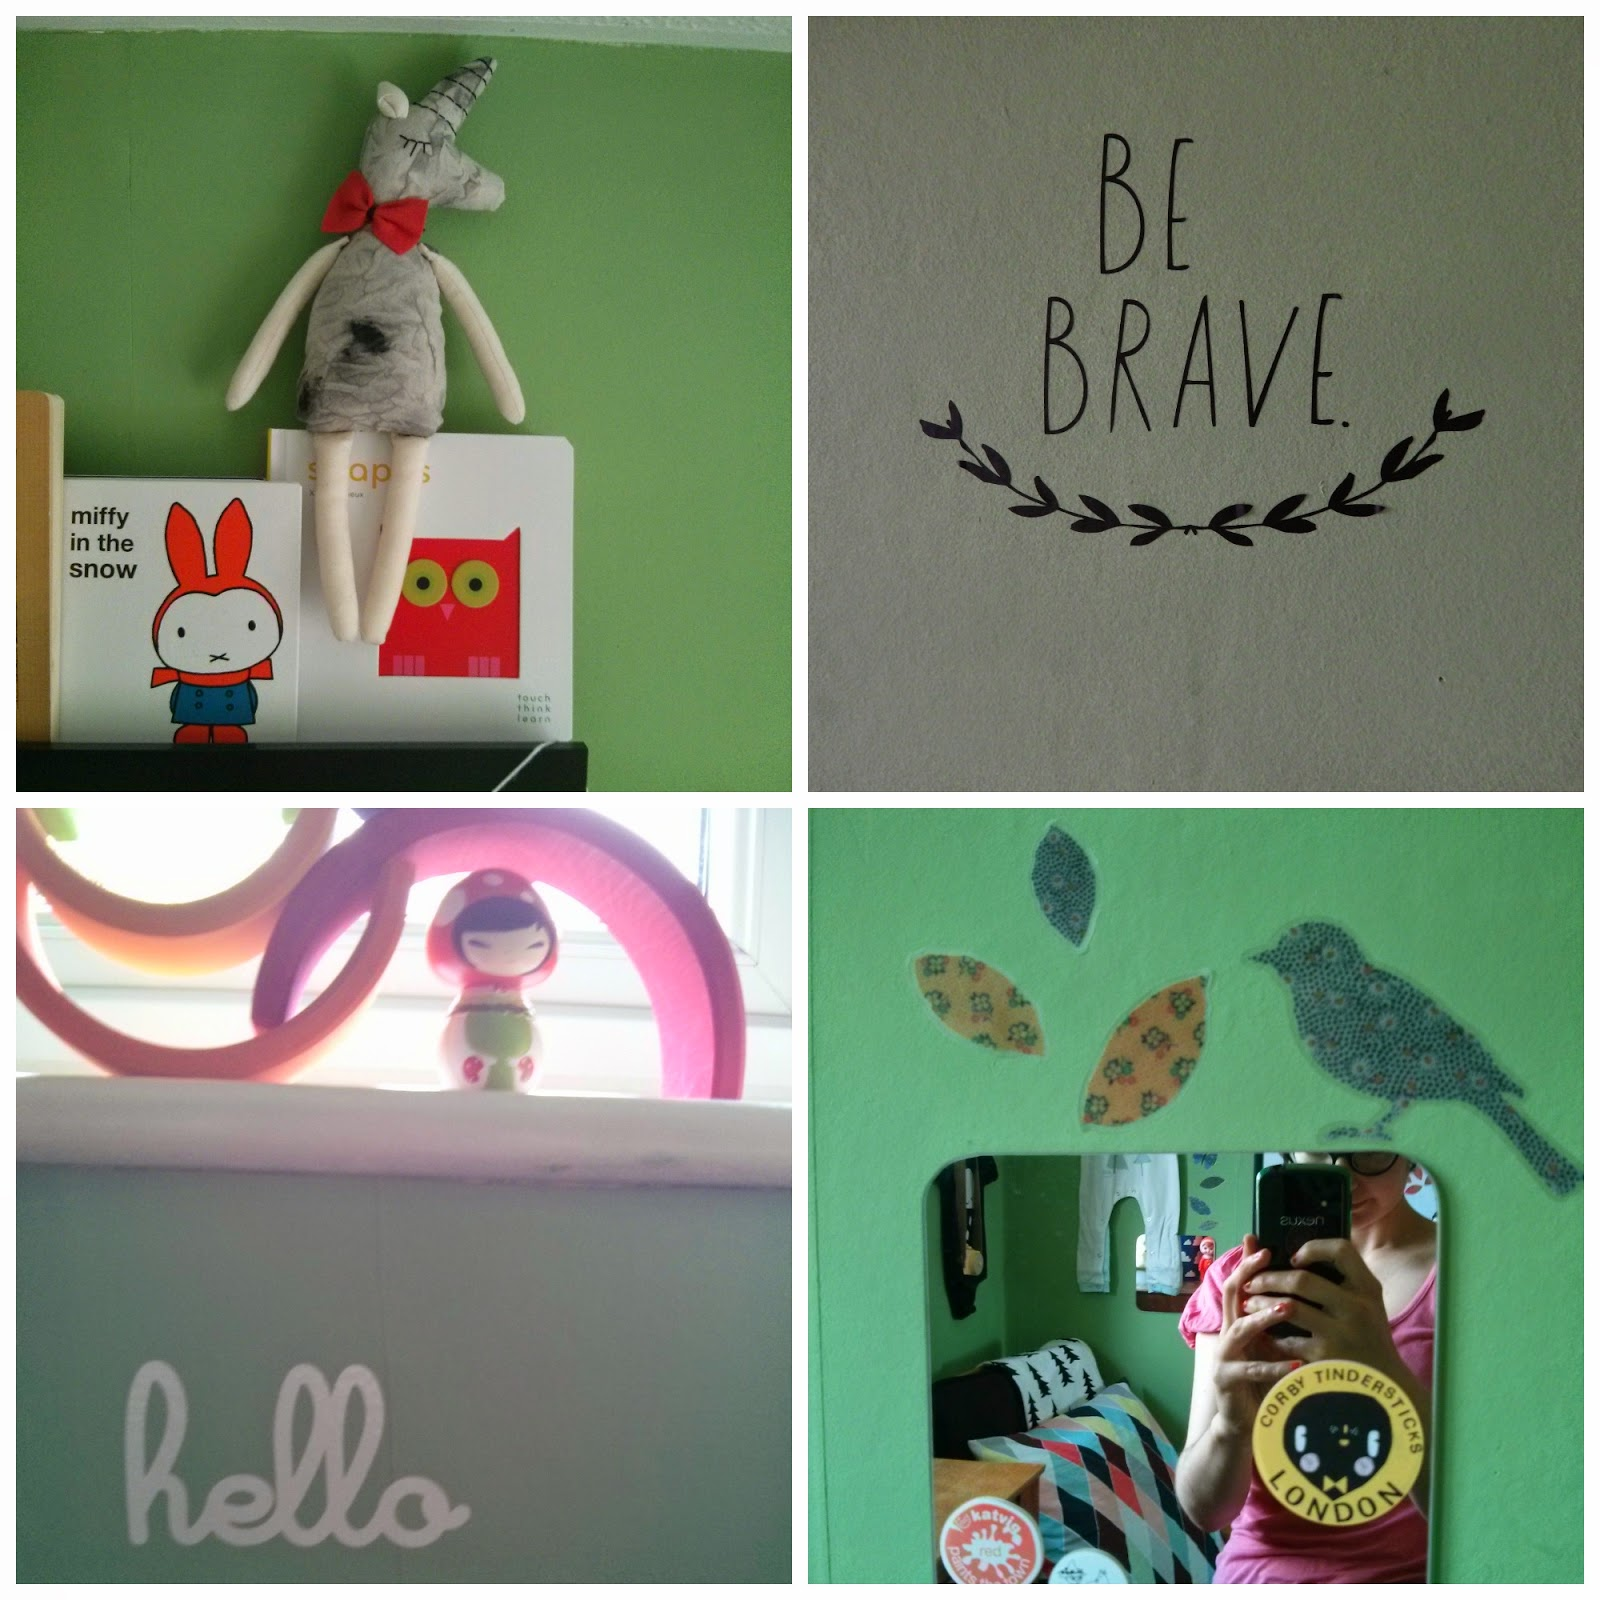 Felix's bedroom. Lucky Boy Sunday, Studio Escargot, Hellow Apparel, Decorating with decals